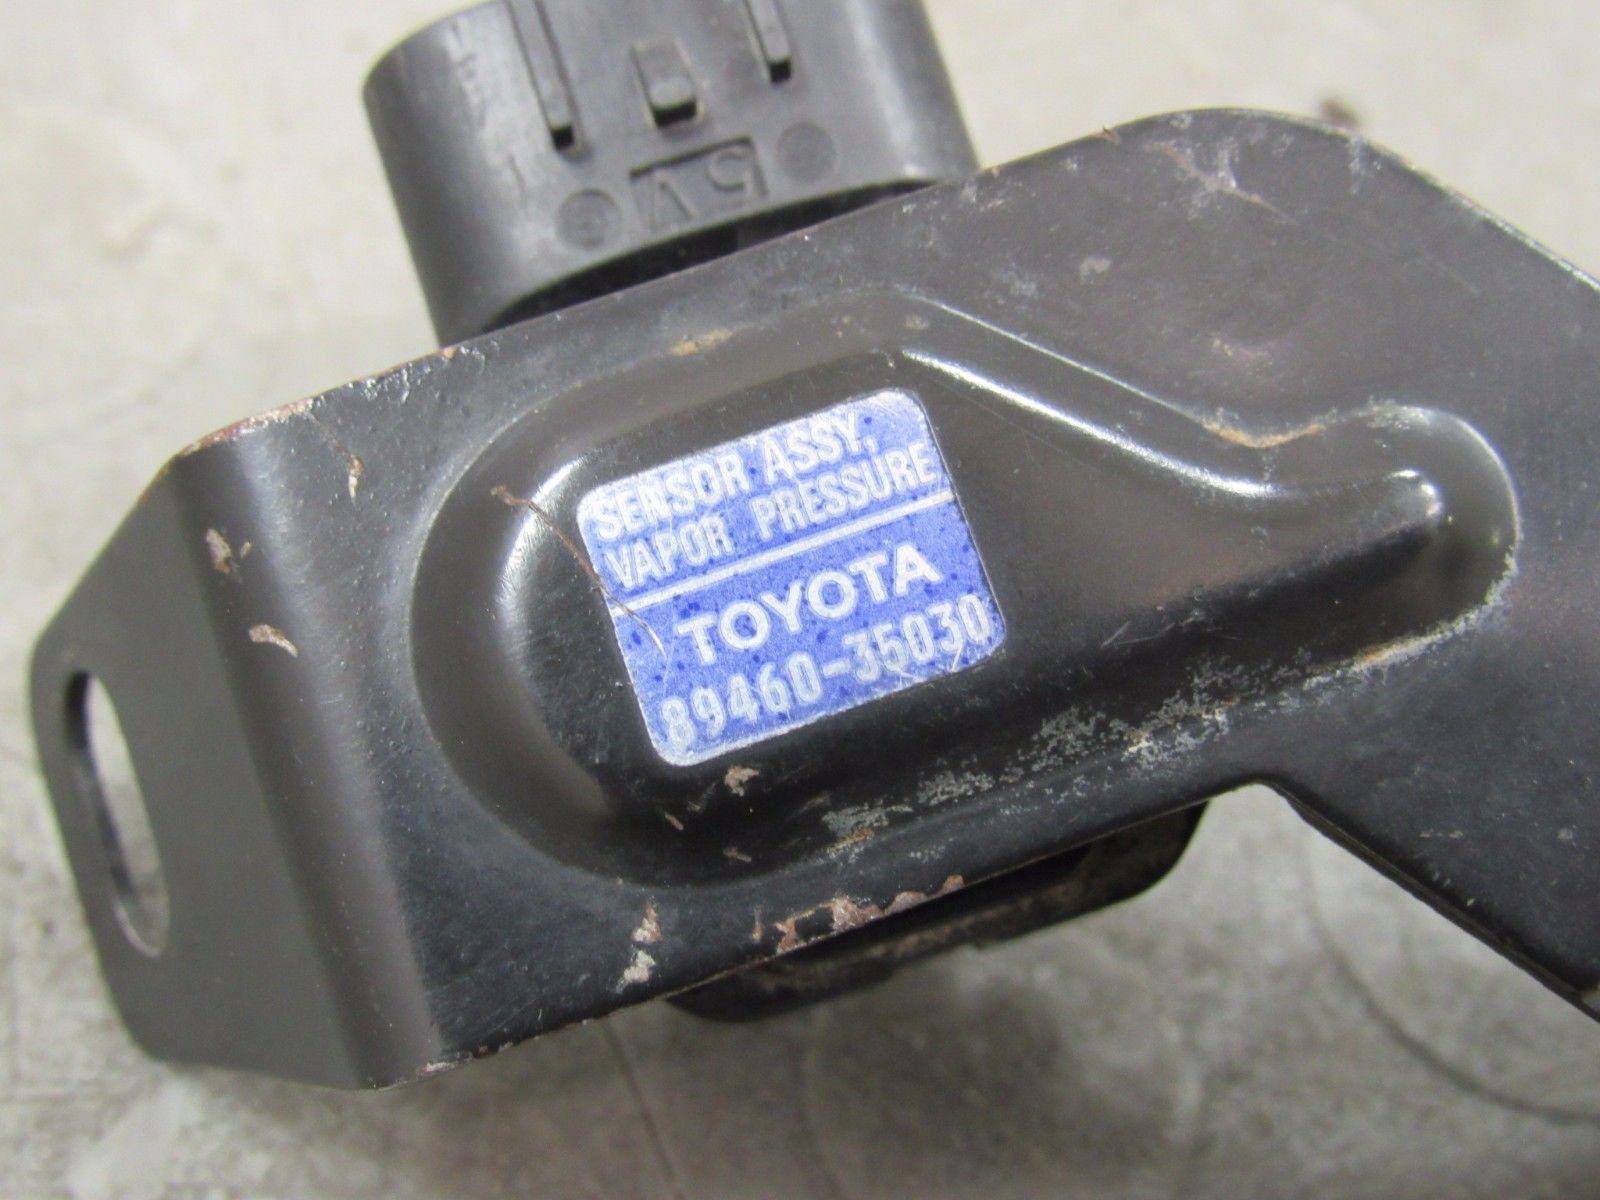 96 00 Toyota 4runner Fuel Vapor Pressure Sensor Assembly Oem 89460 2000 Air 35030 N